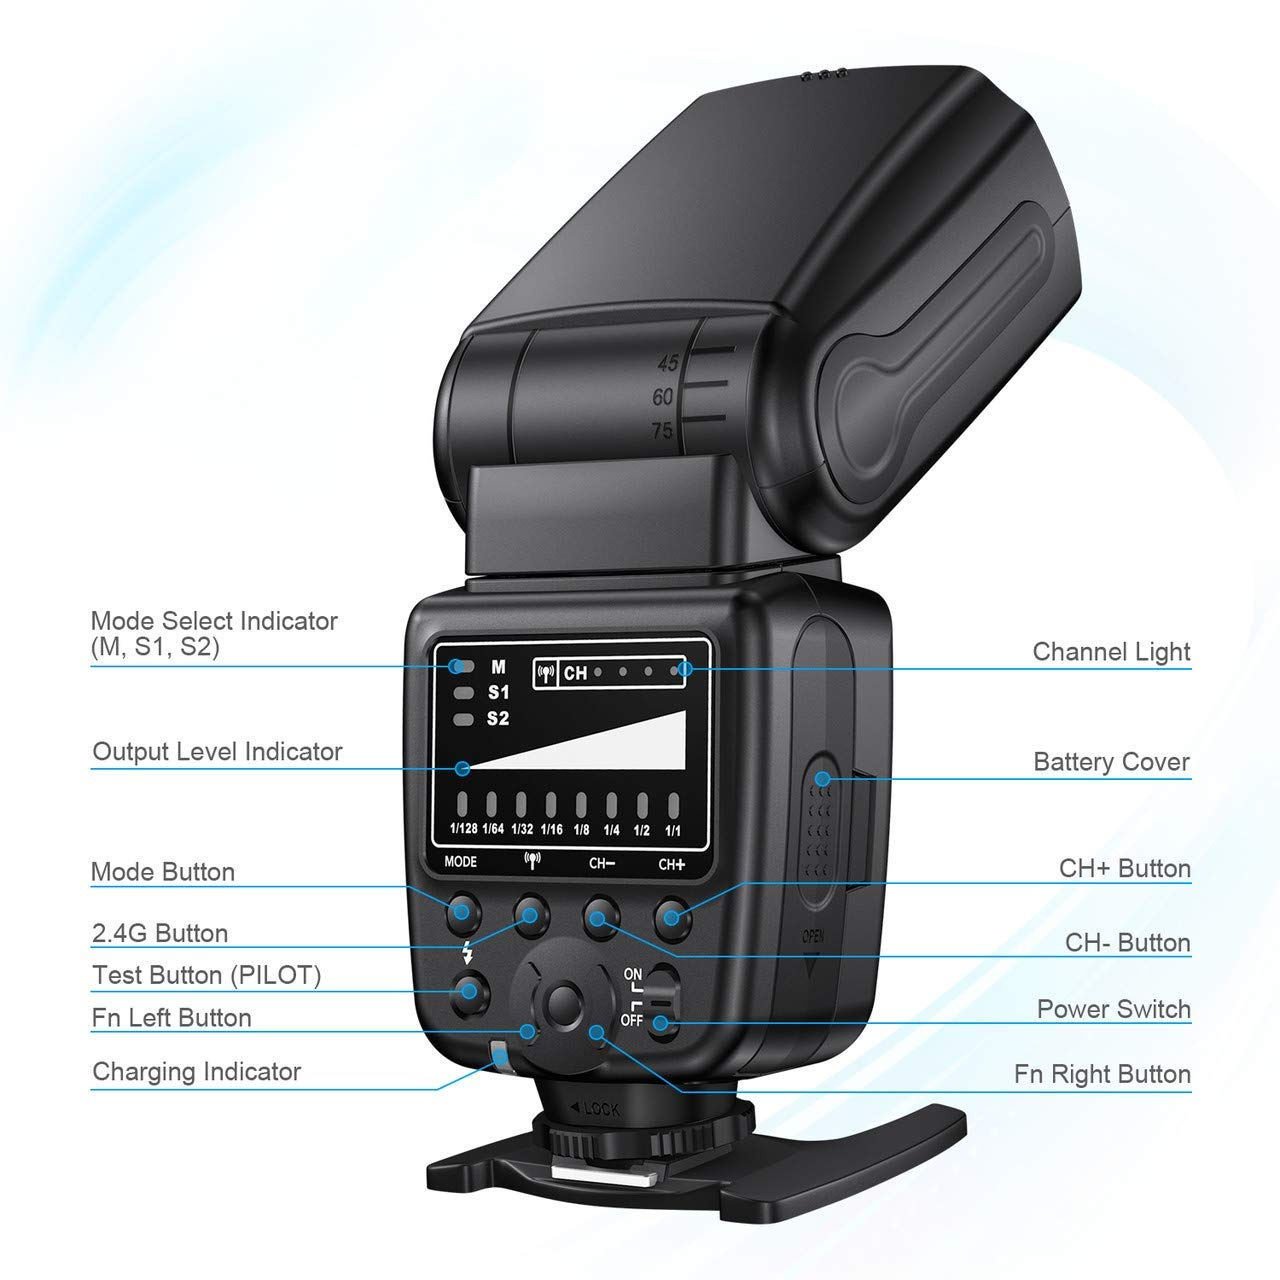 2.4G Wireless Flash Speedlite Trigger Controller for Canon Nikon Olympus Pentax